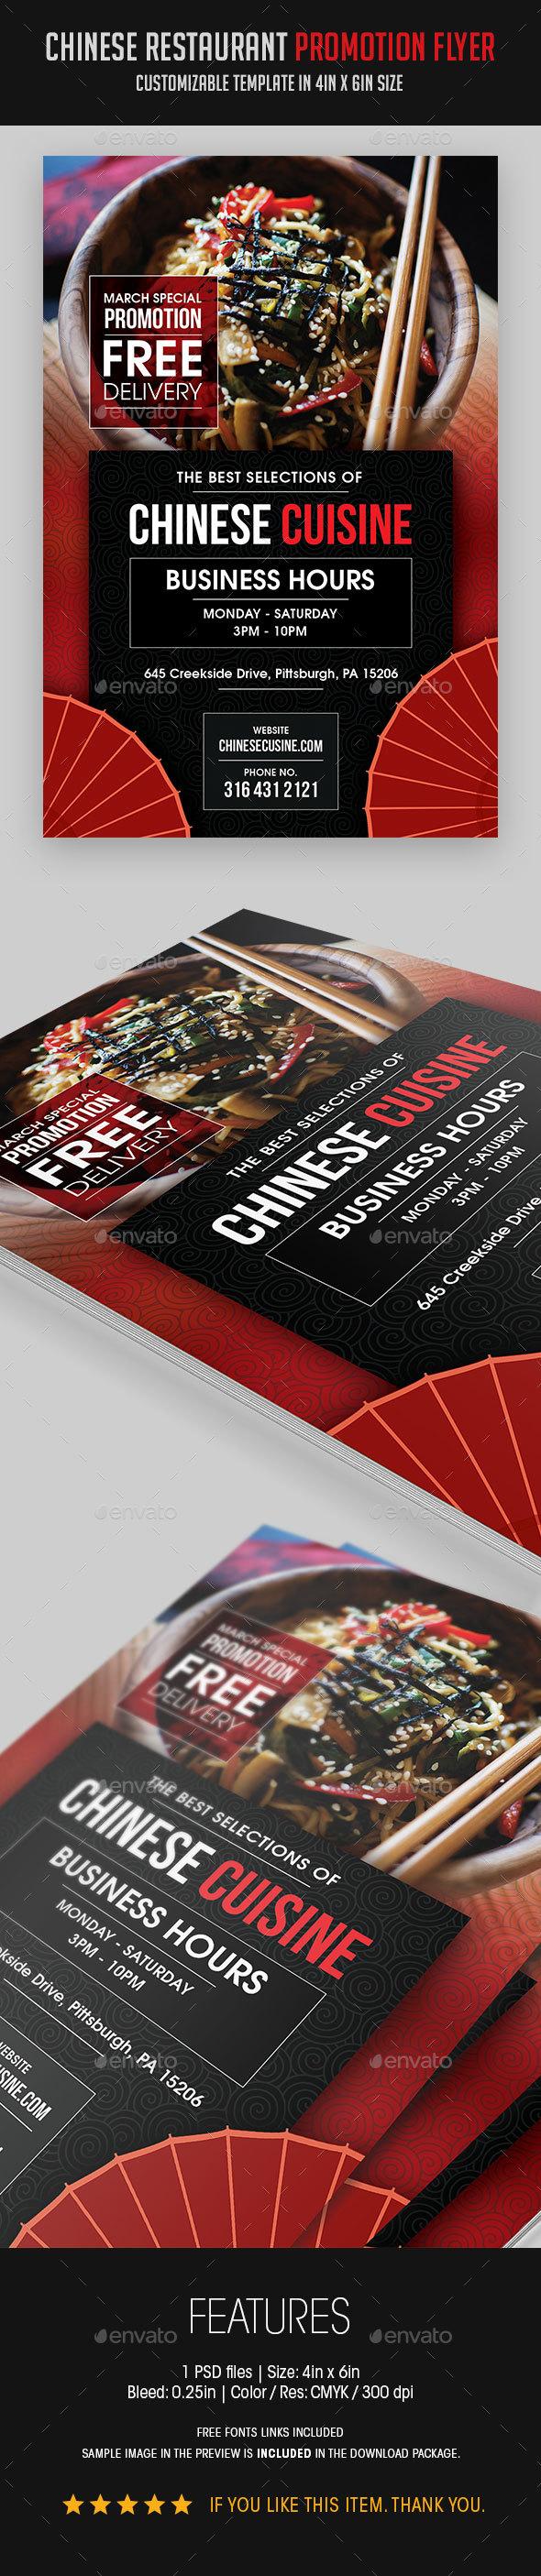 Chinese Restaurant Promotional Flyer - Restaurant Flyers